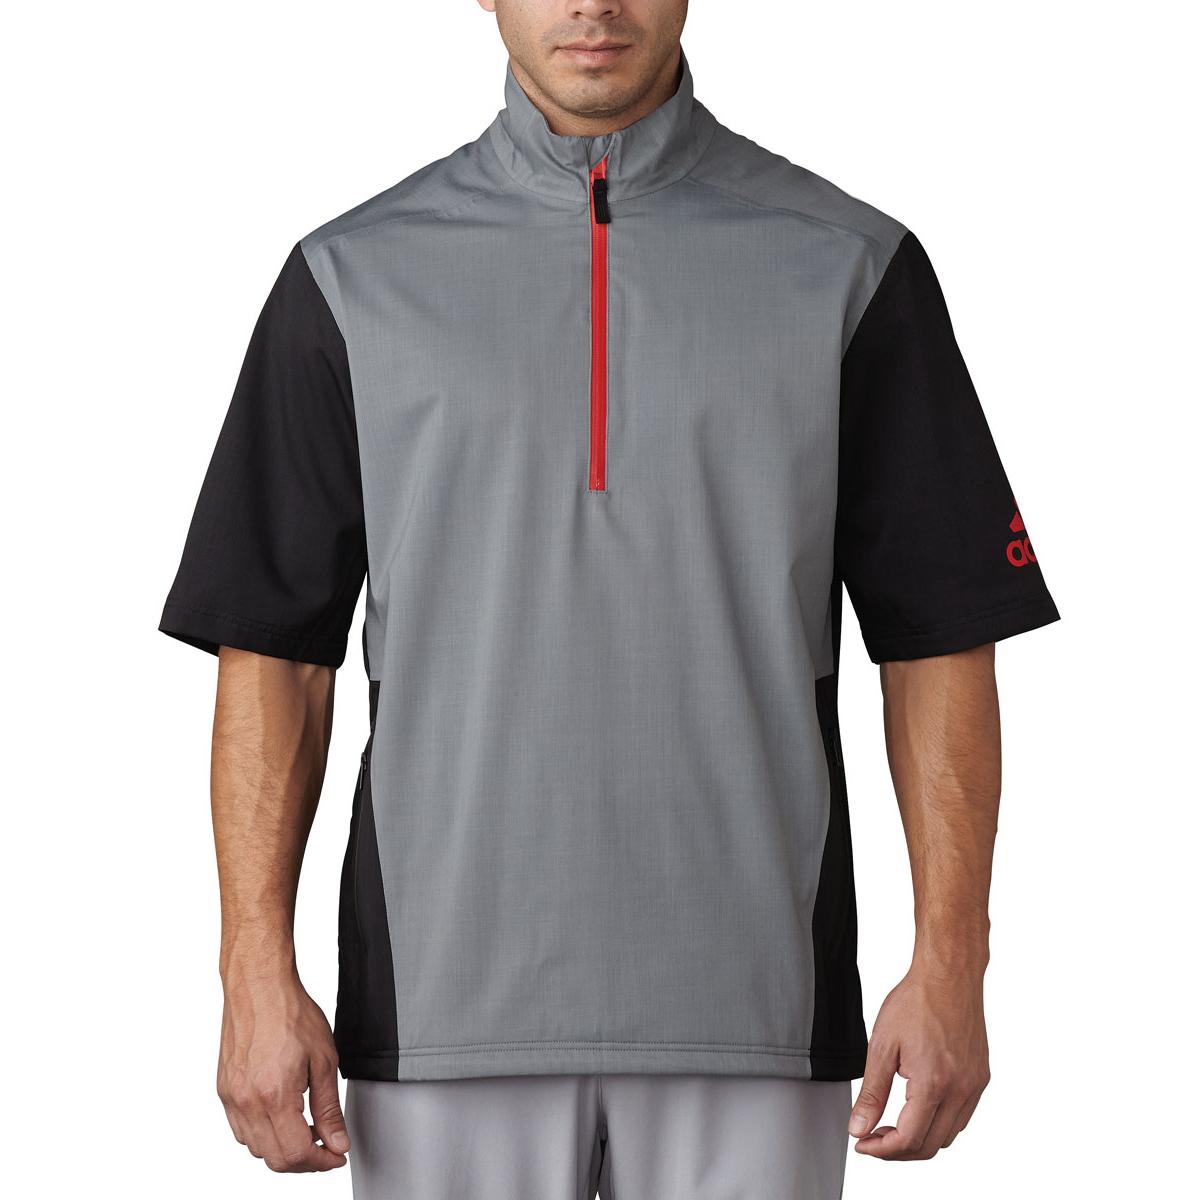 adidas Golf Climaproof Heathered Rain Jacket